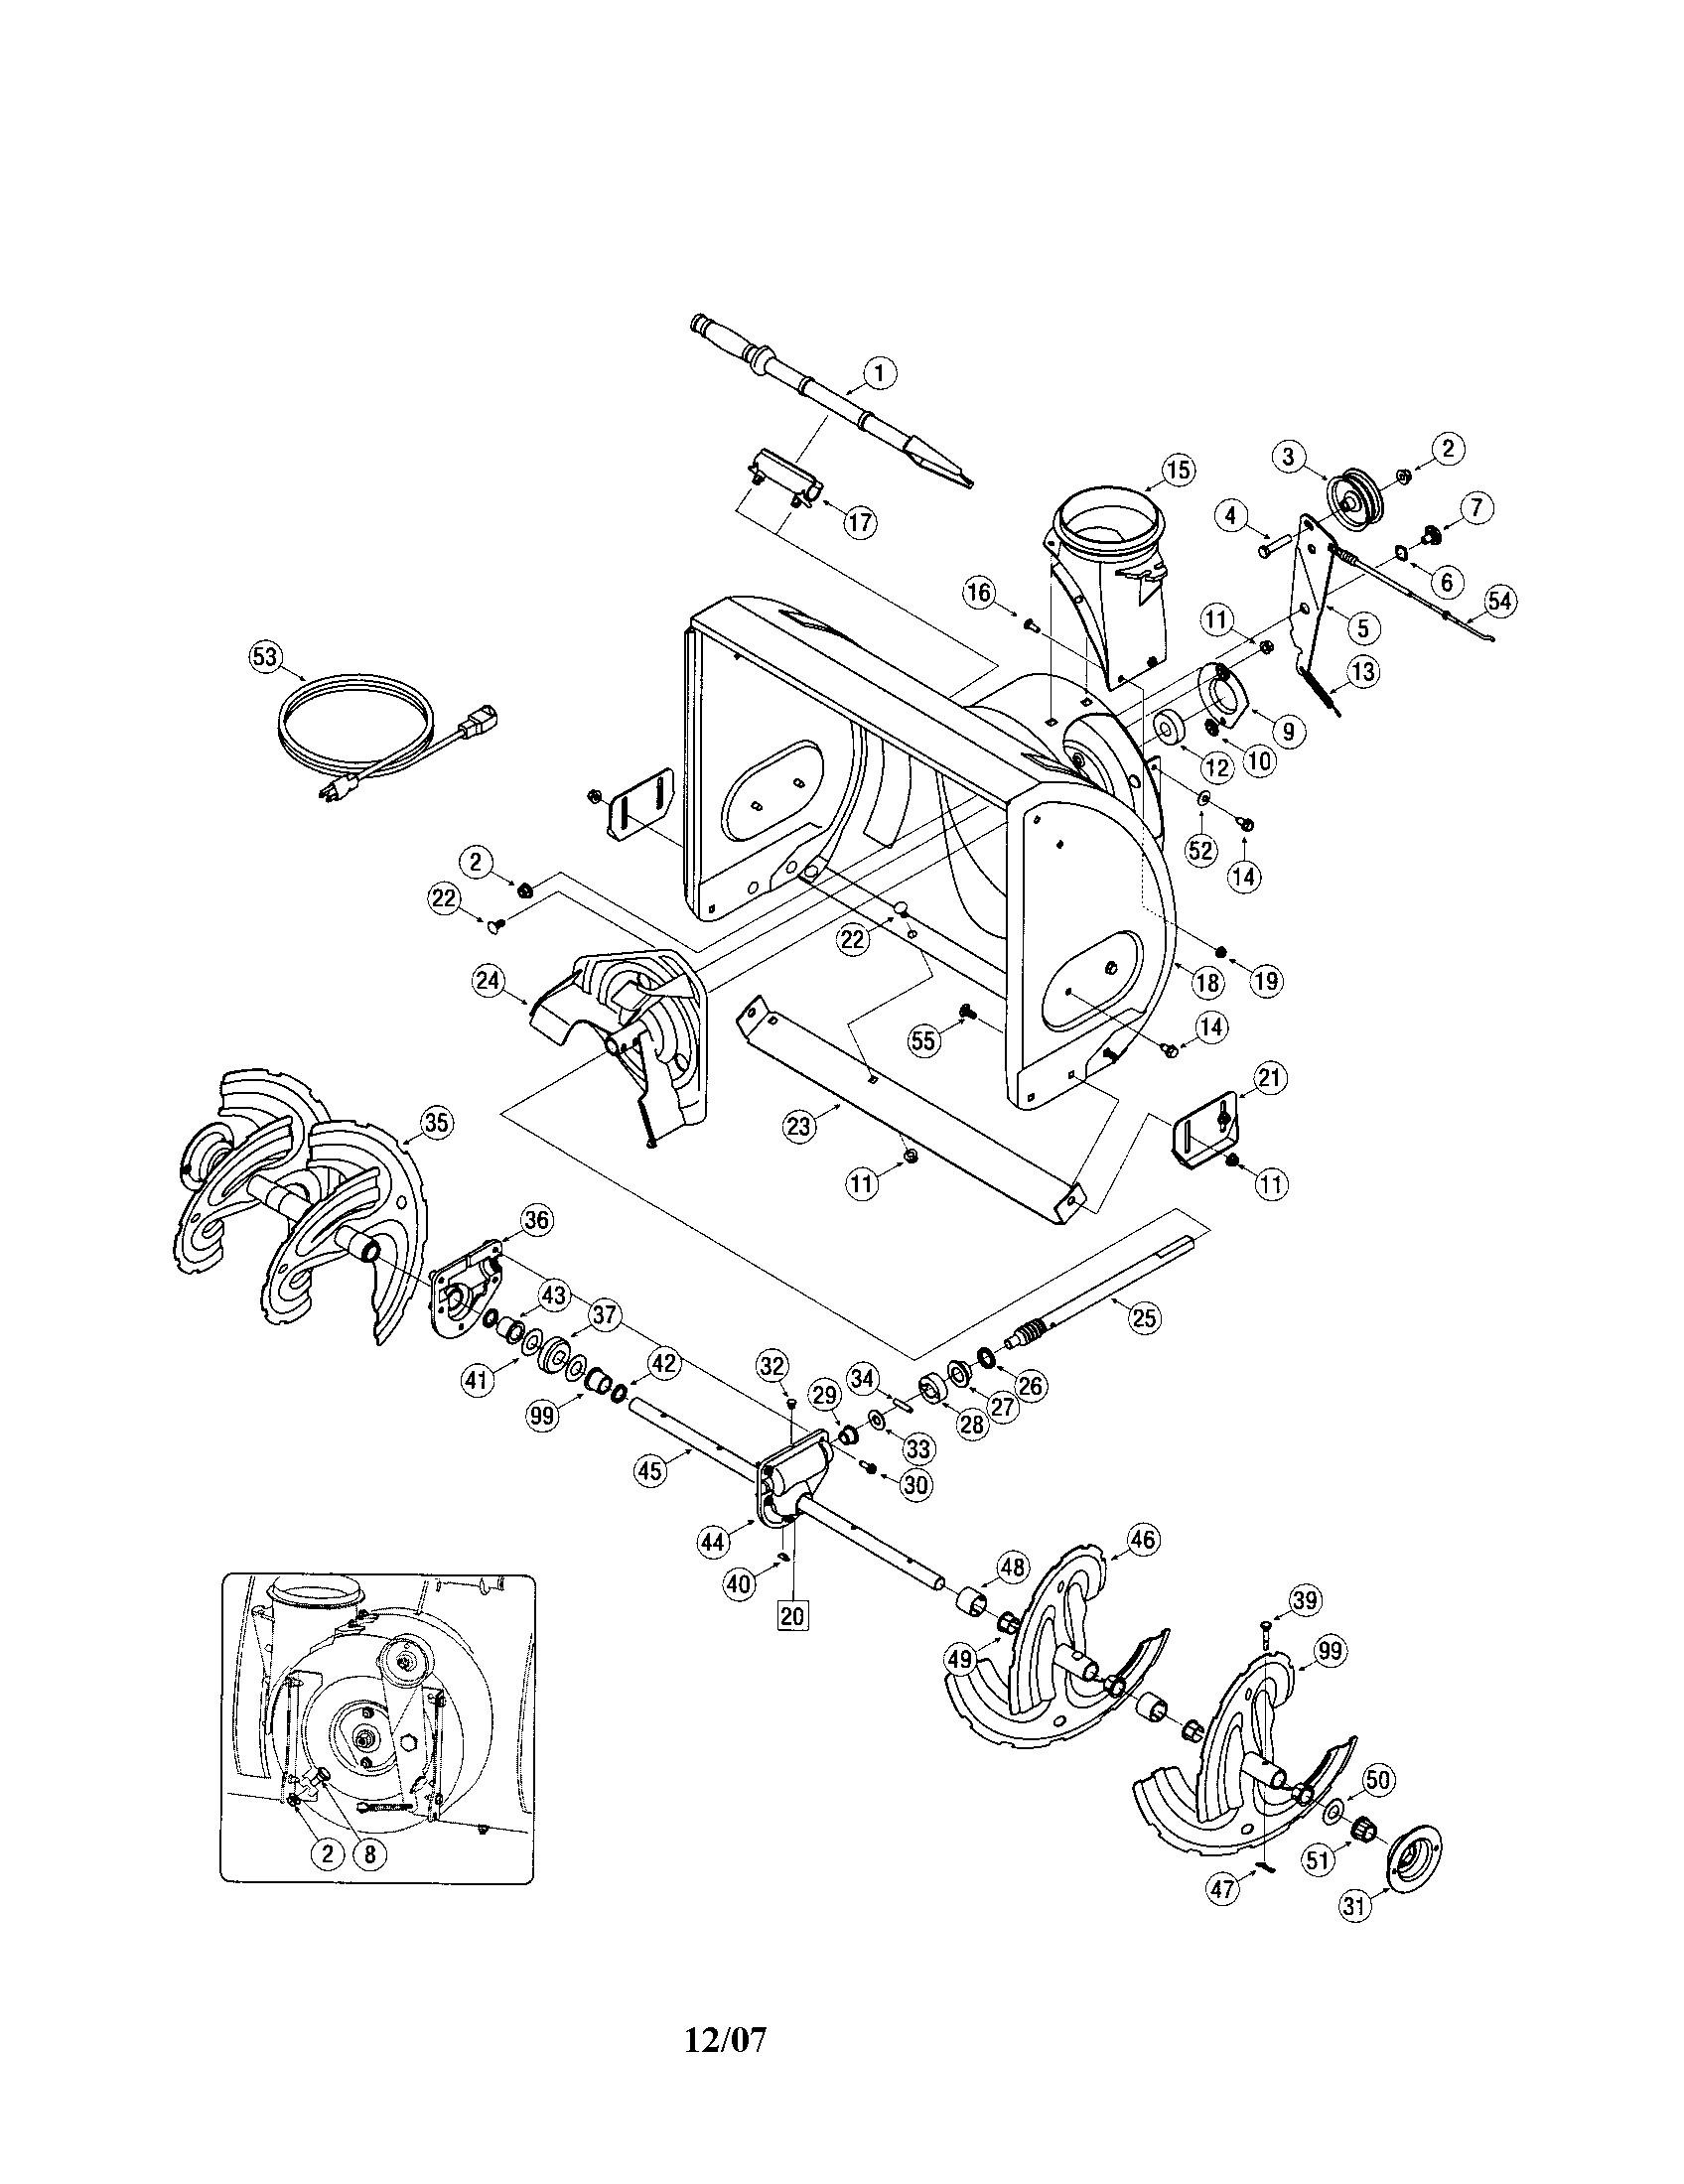 grizzly 550 wiring diagram, yfz450 wiring diagram, t-rex 450 wiring diagram,